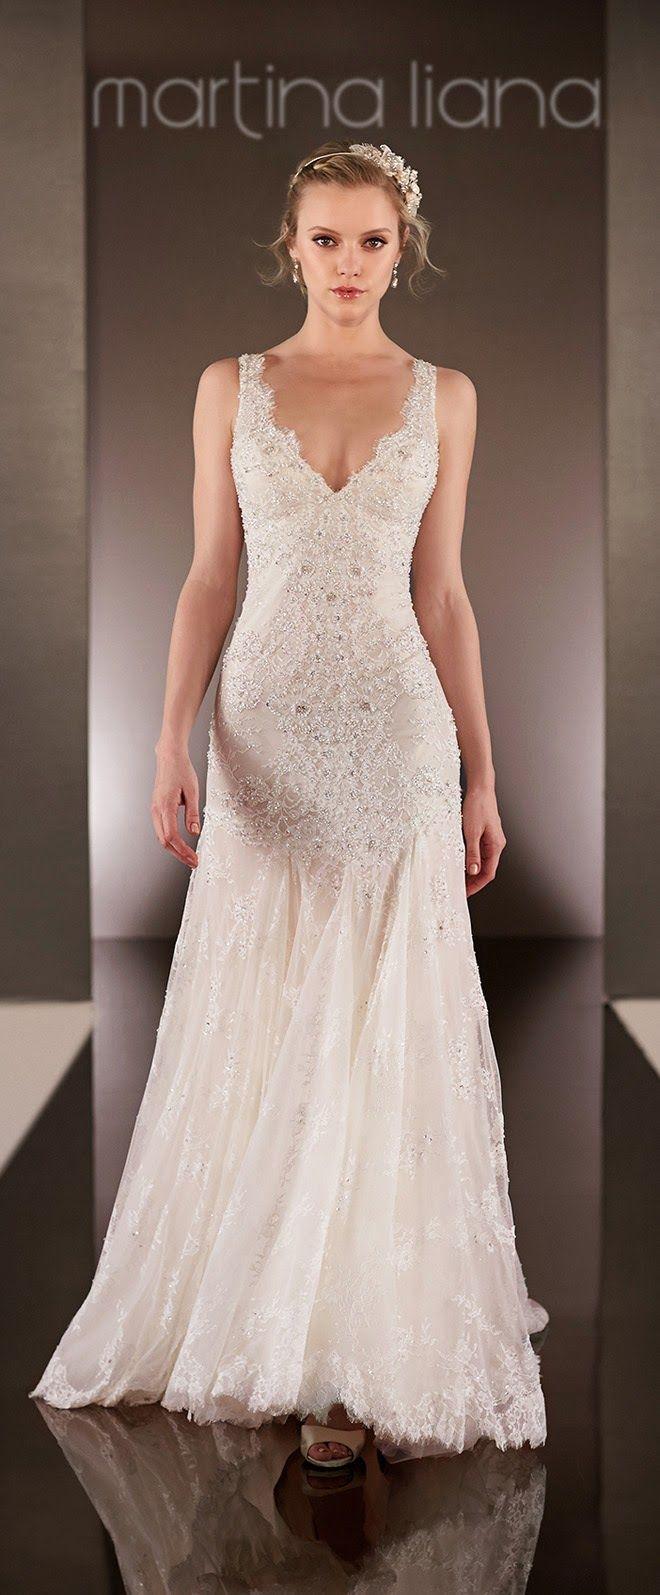 wedding-dresses-martina-liana-spring-2015-bridal-collection-595_alt1_zoom.jpg (660×1595)